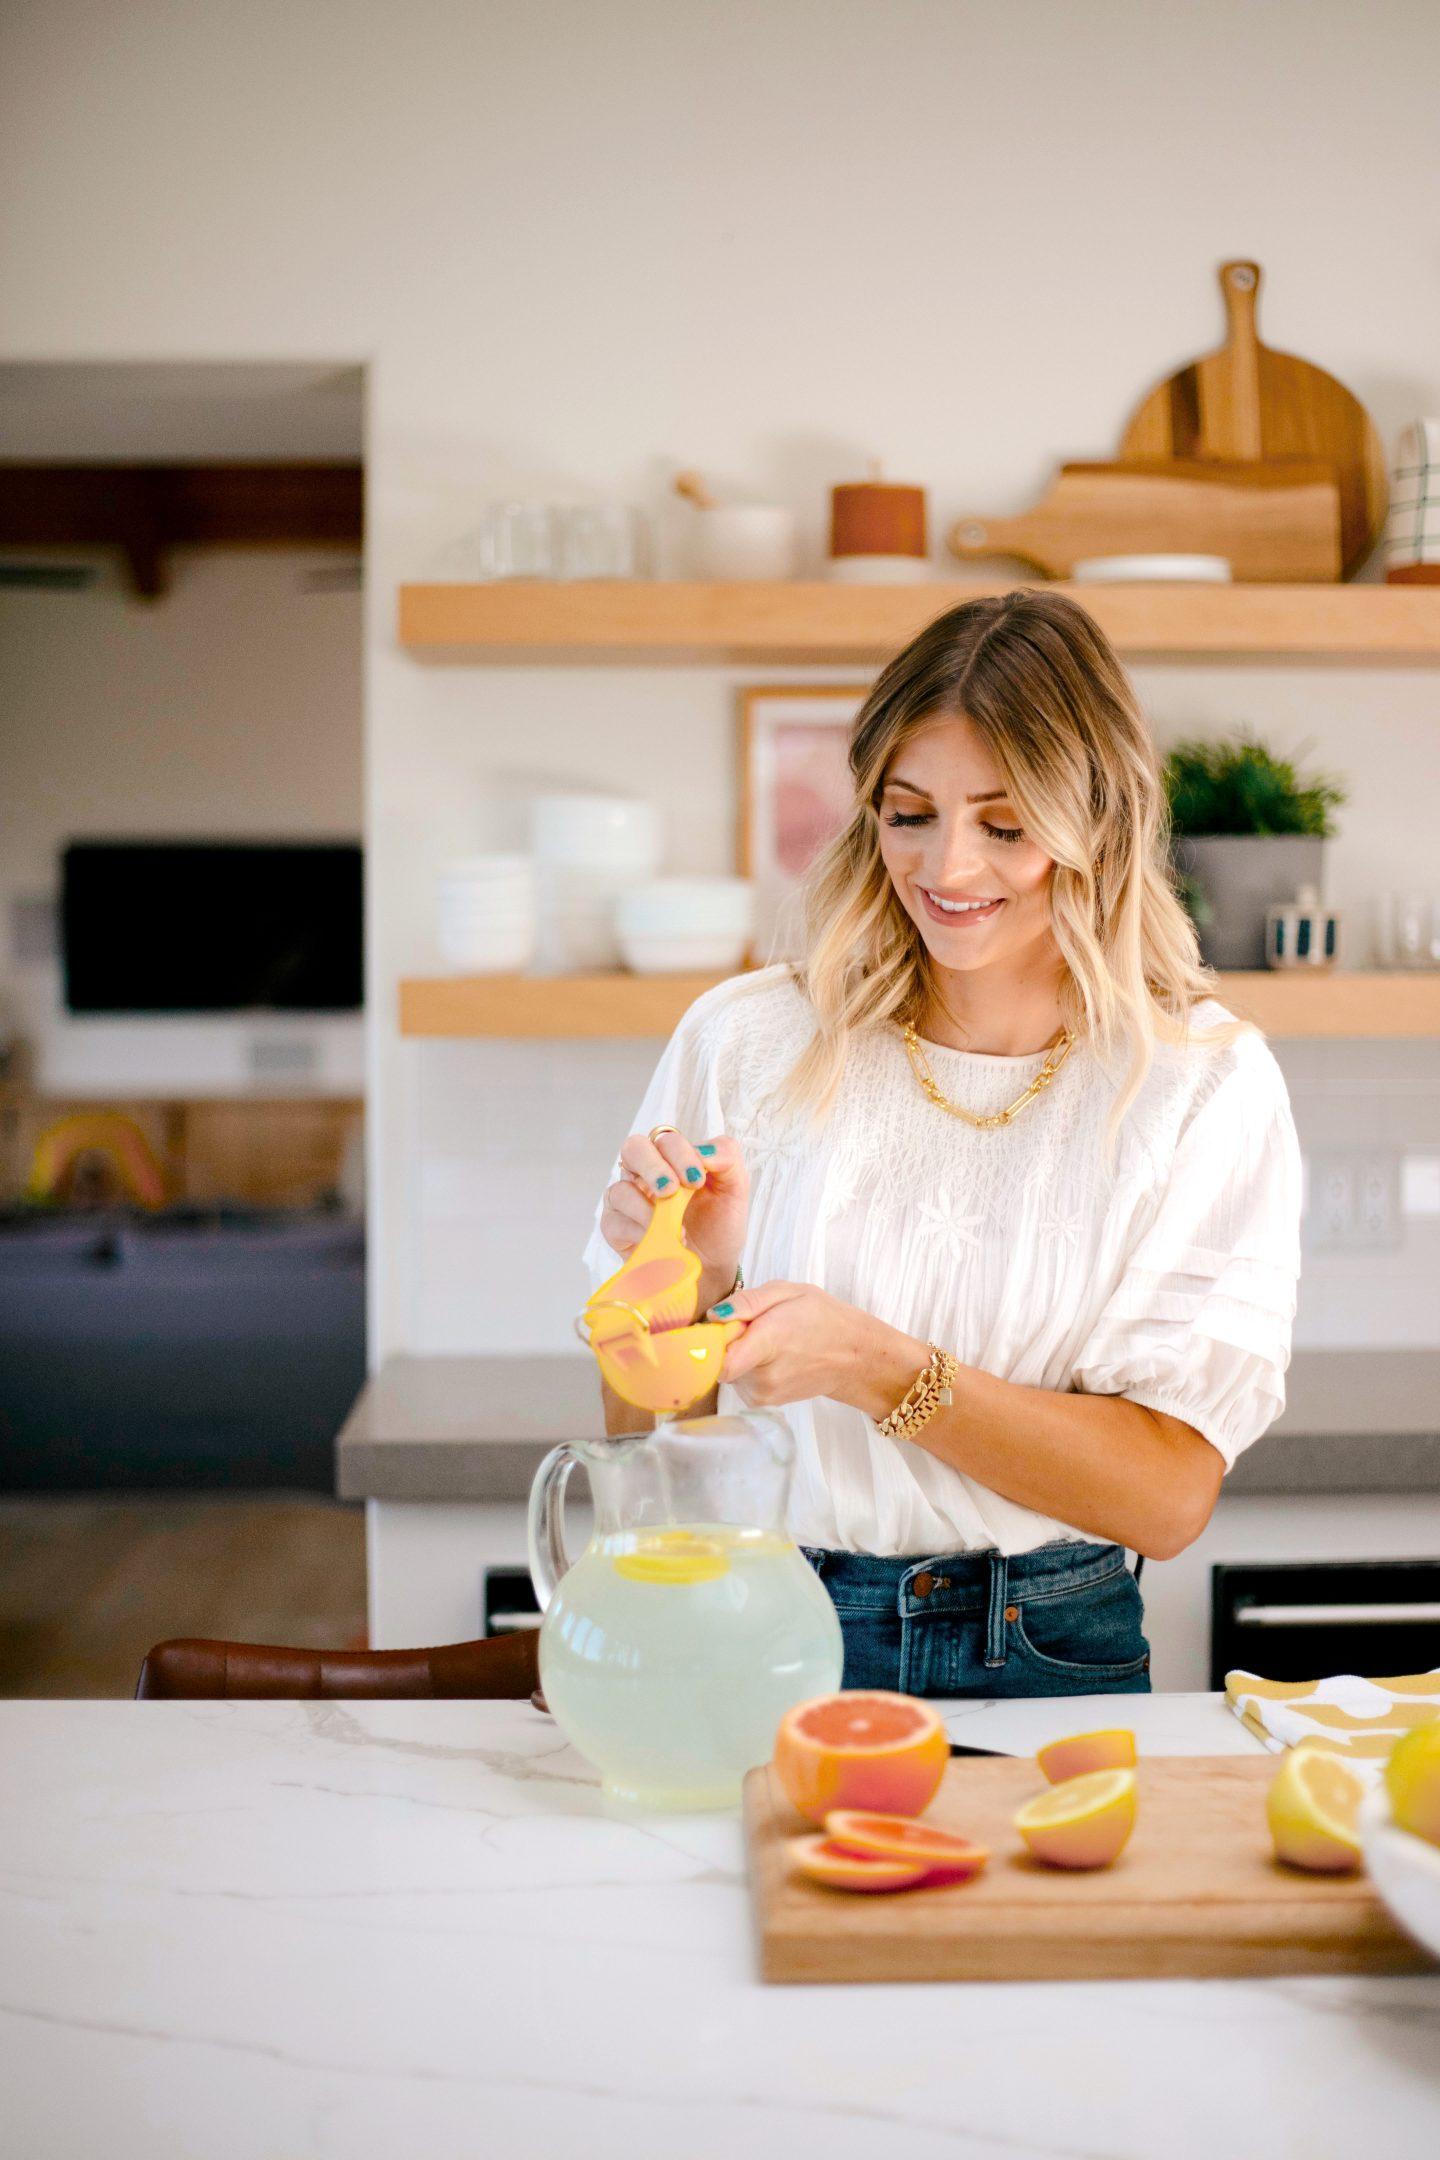 woman squeezing lemon for lemonade